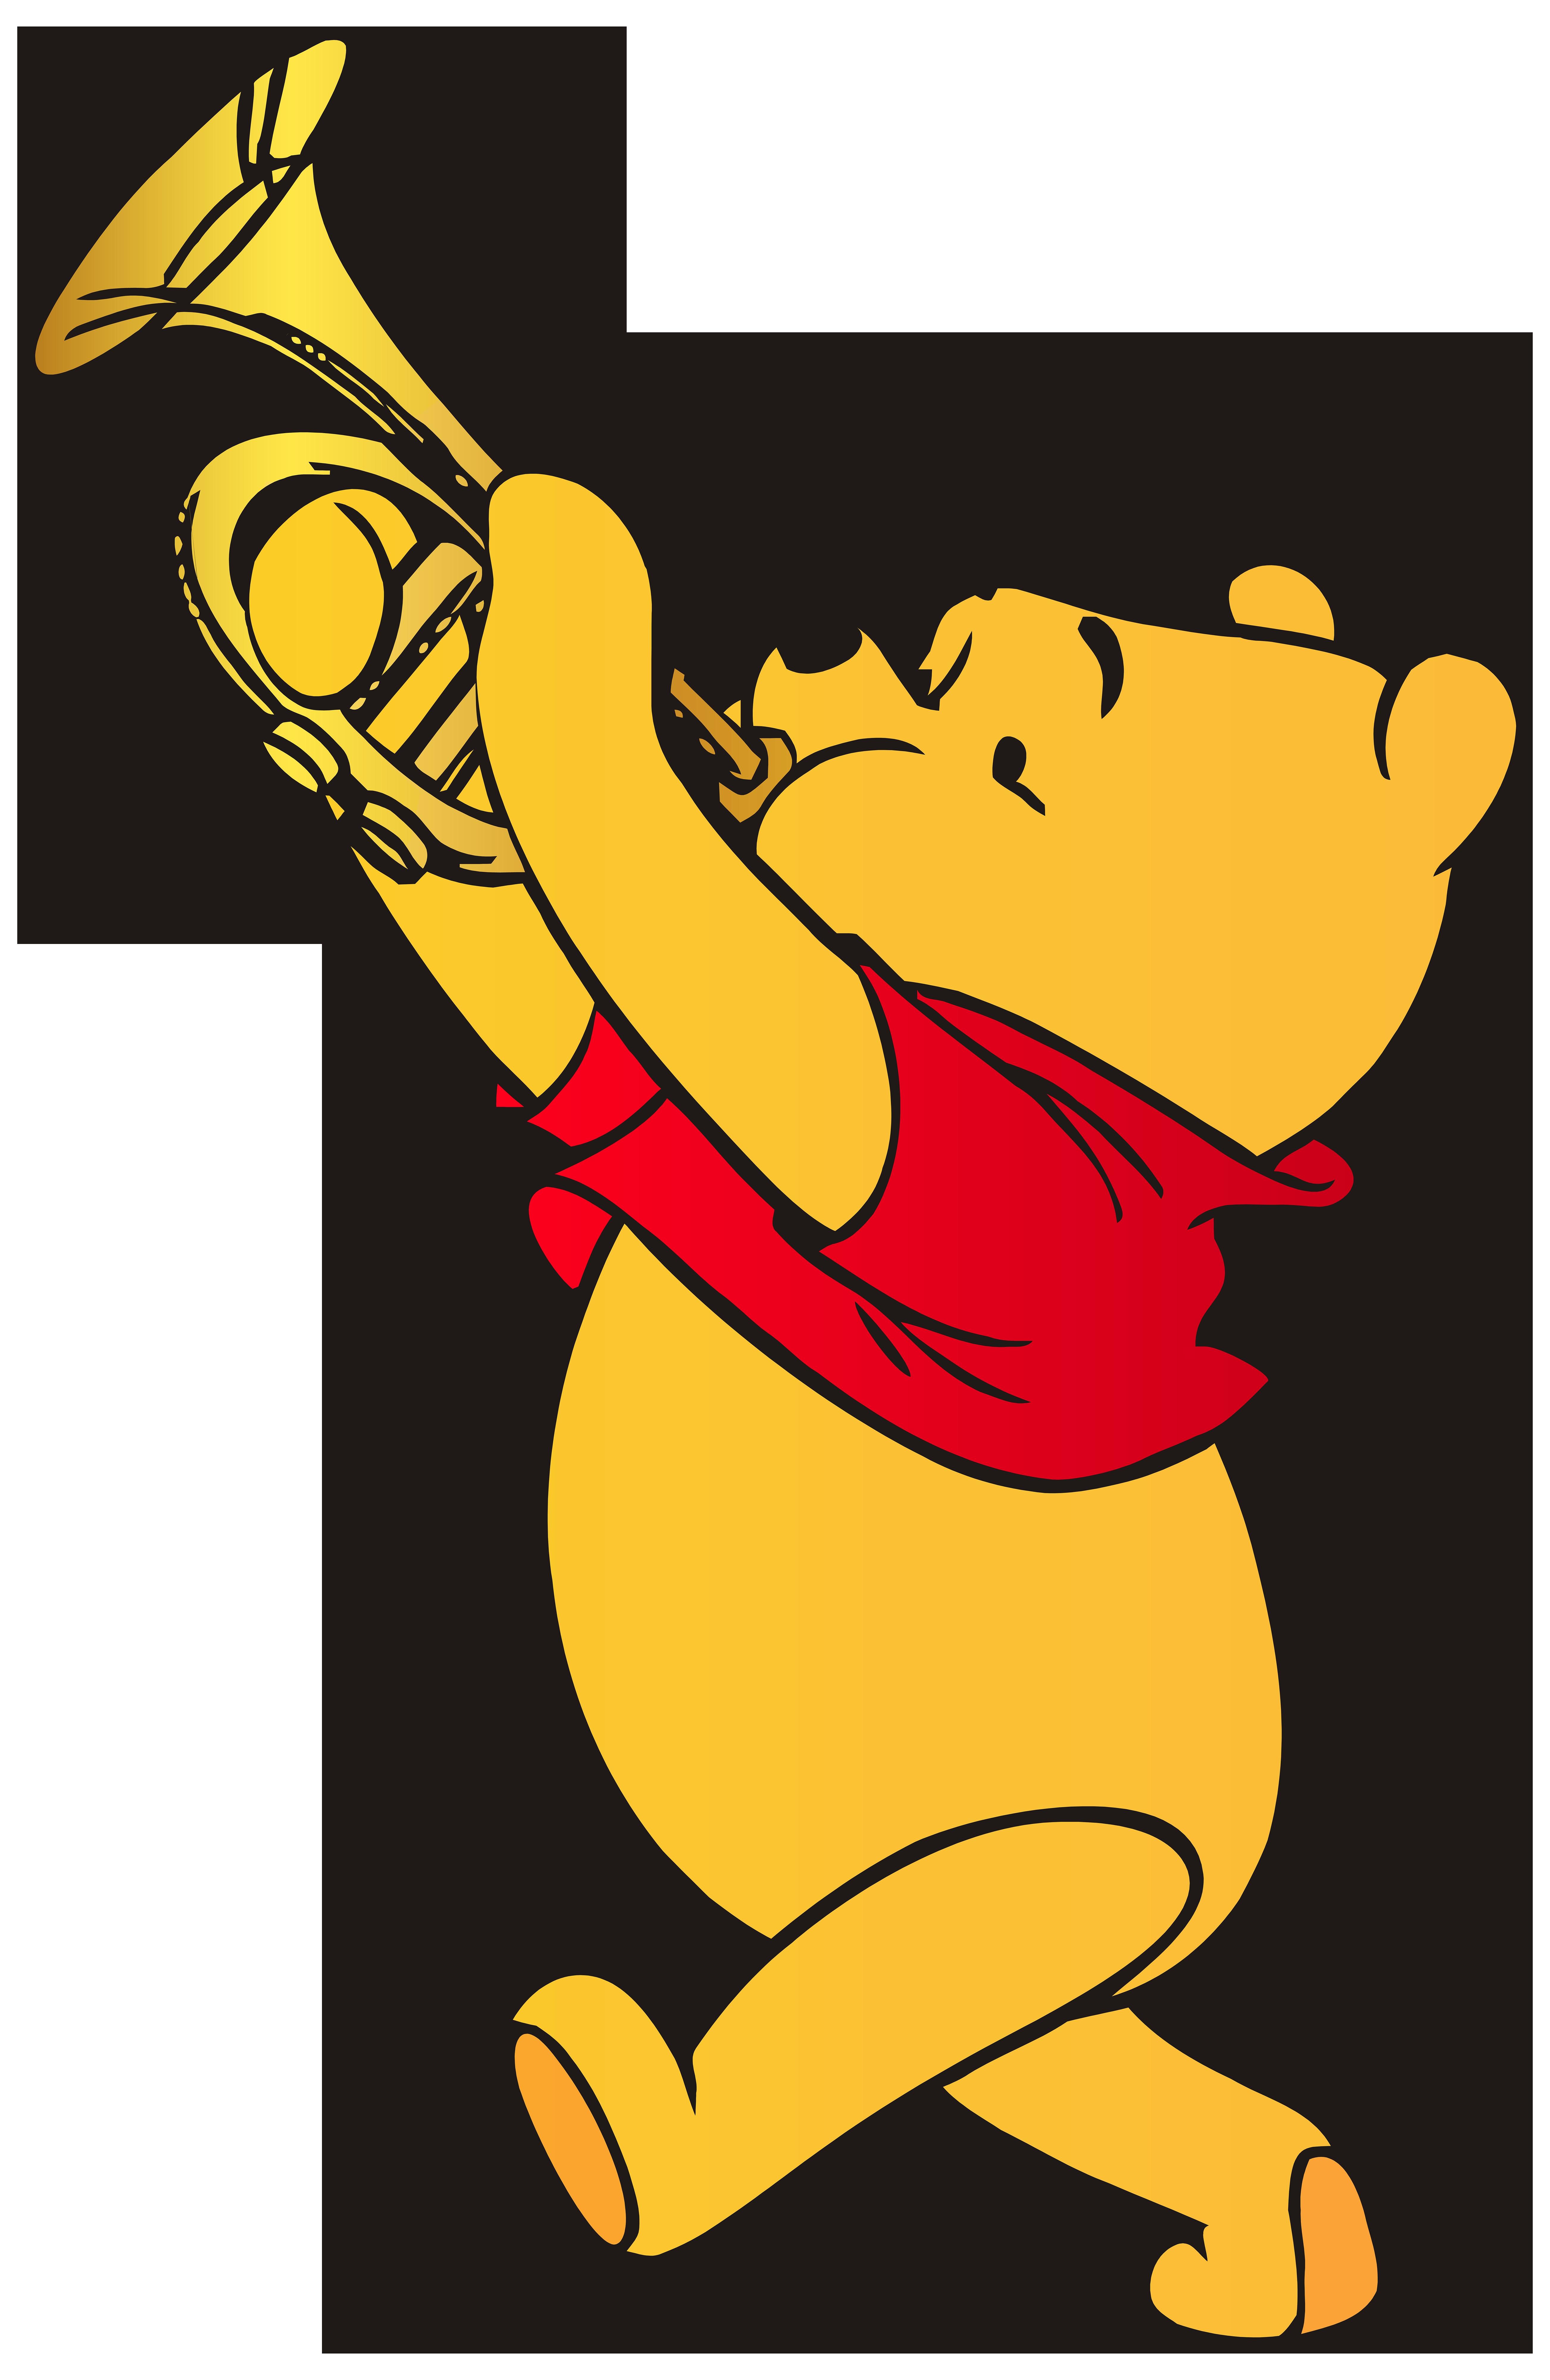 5209x8000 New Winnie The Pooh Clipart Design